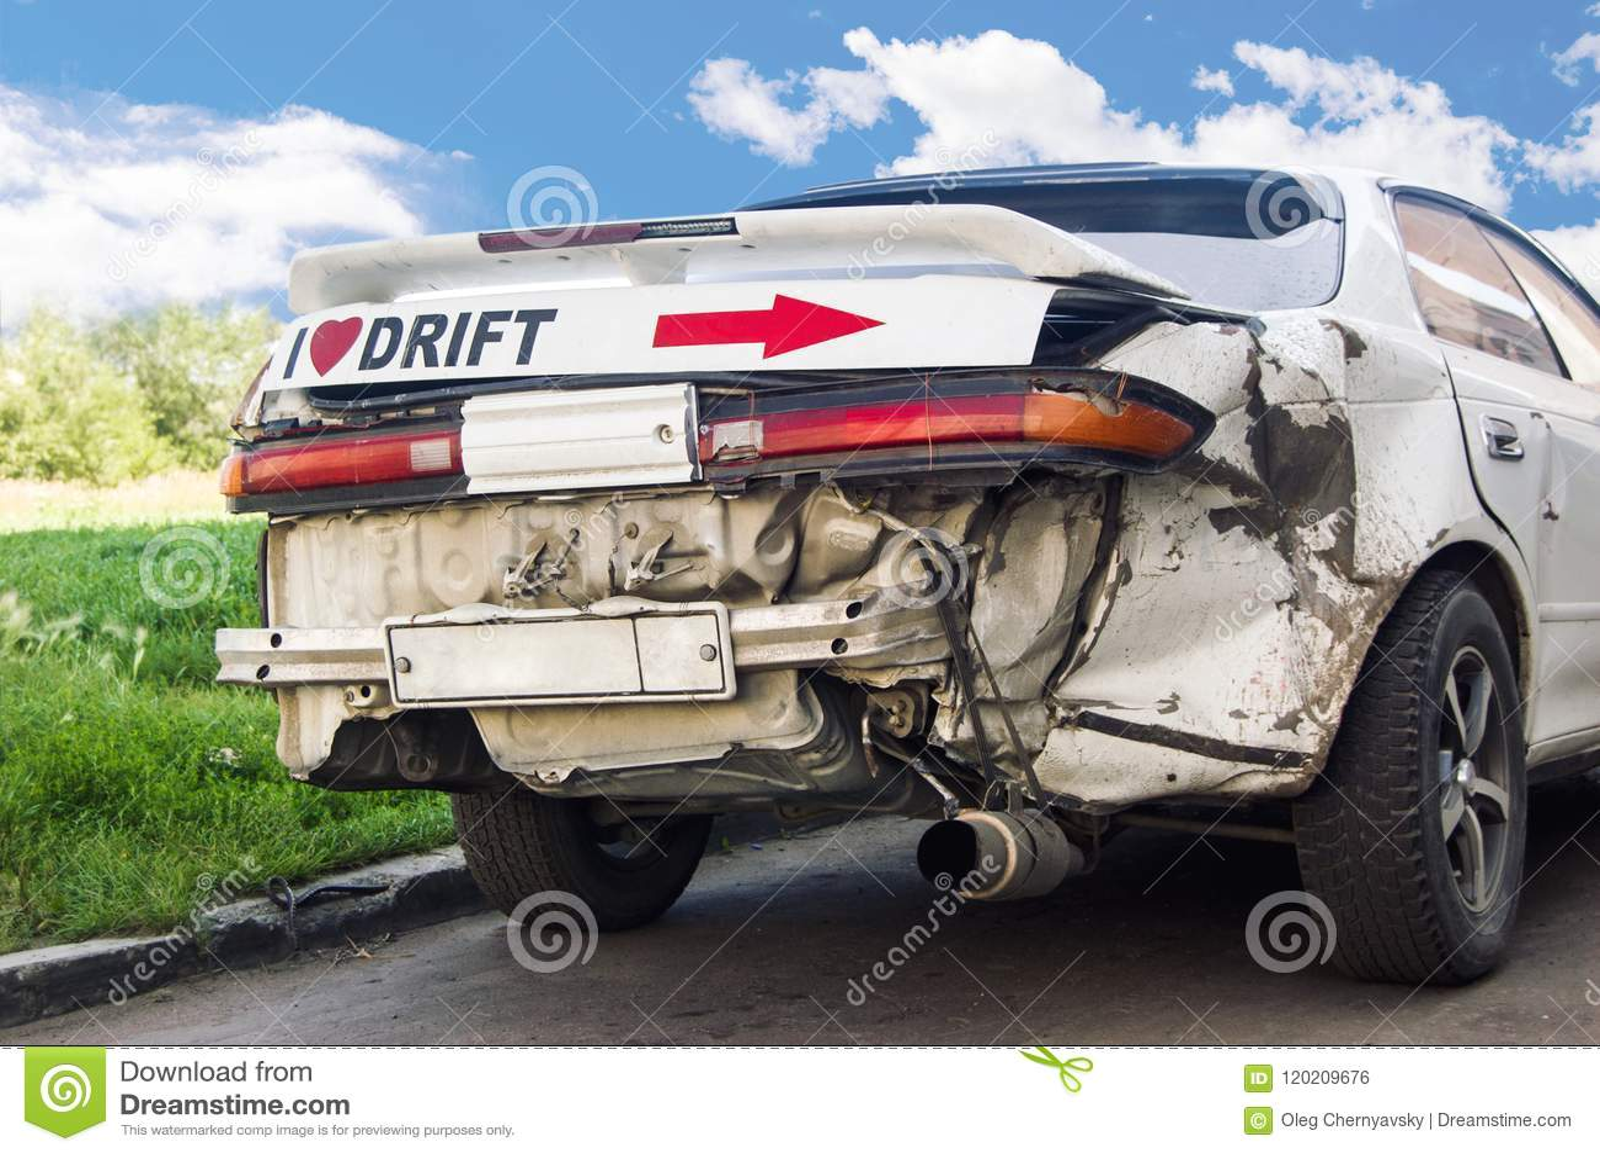 Battered drift car